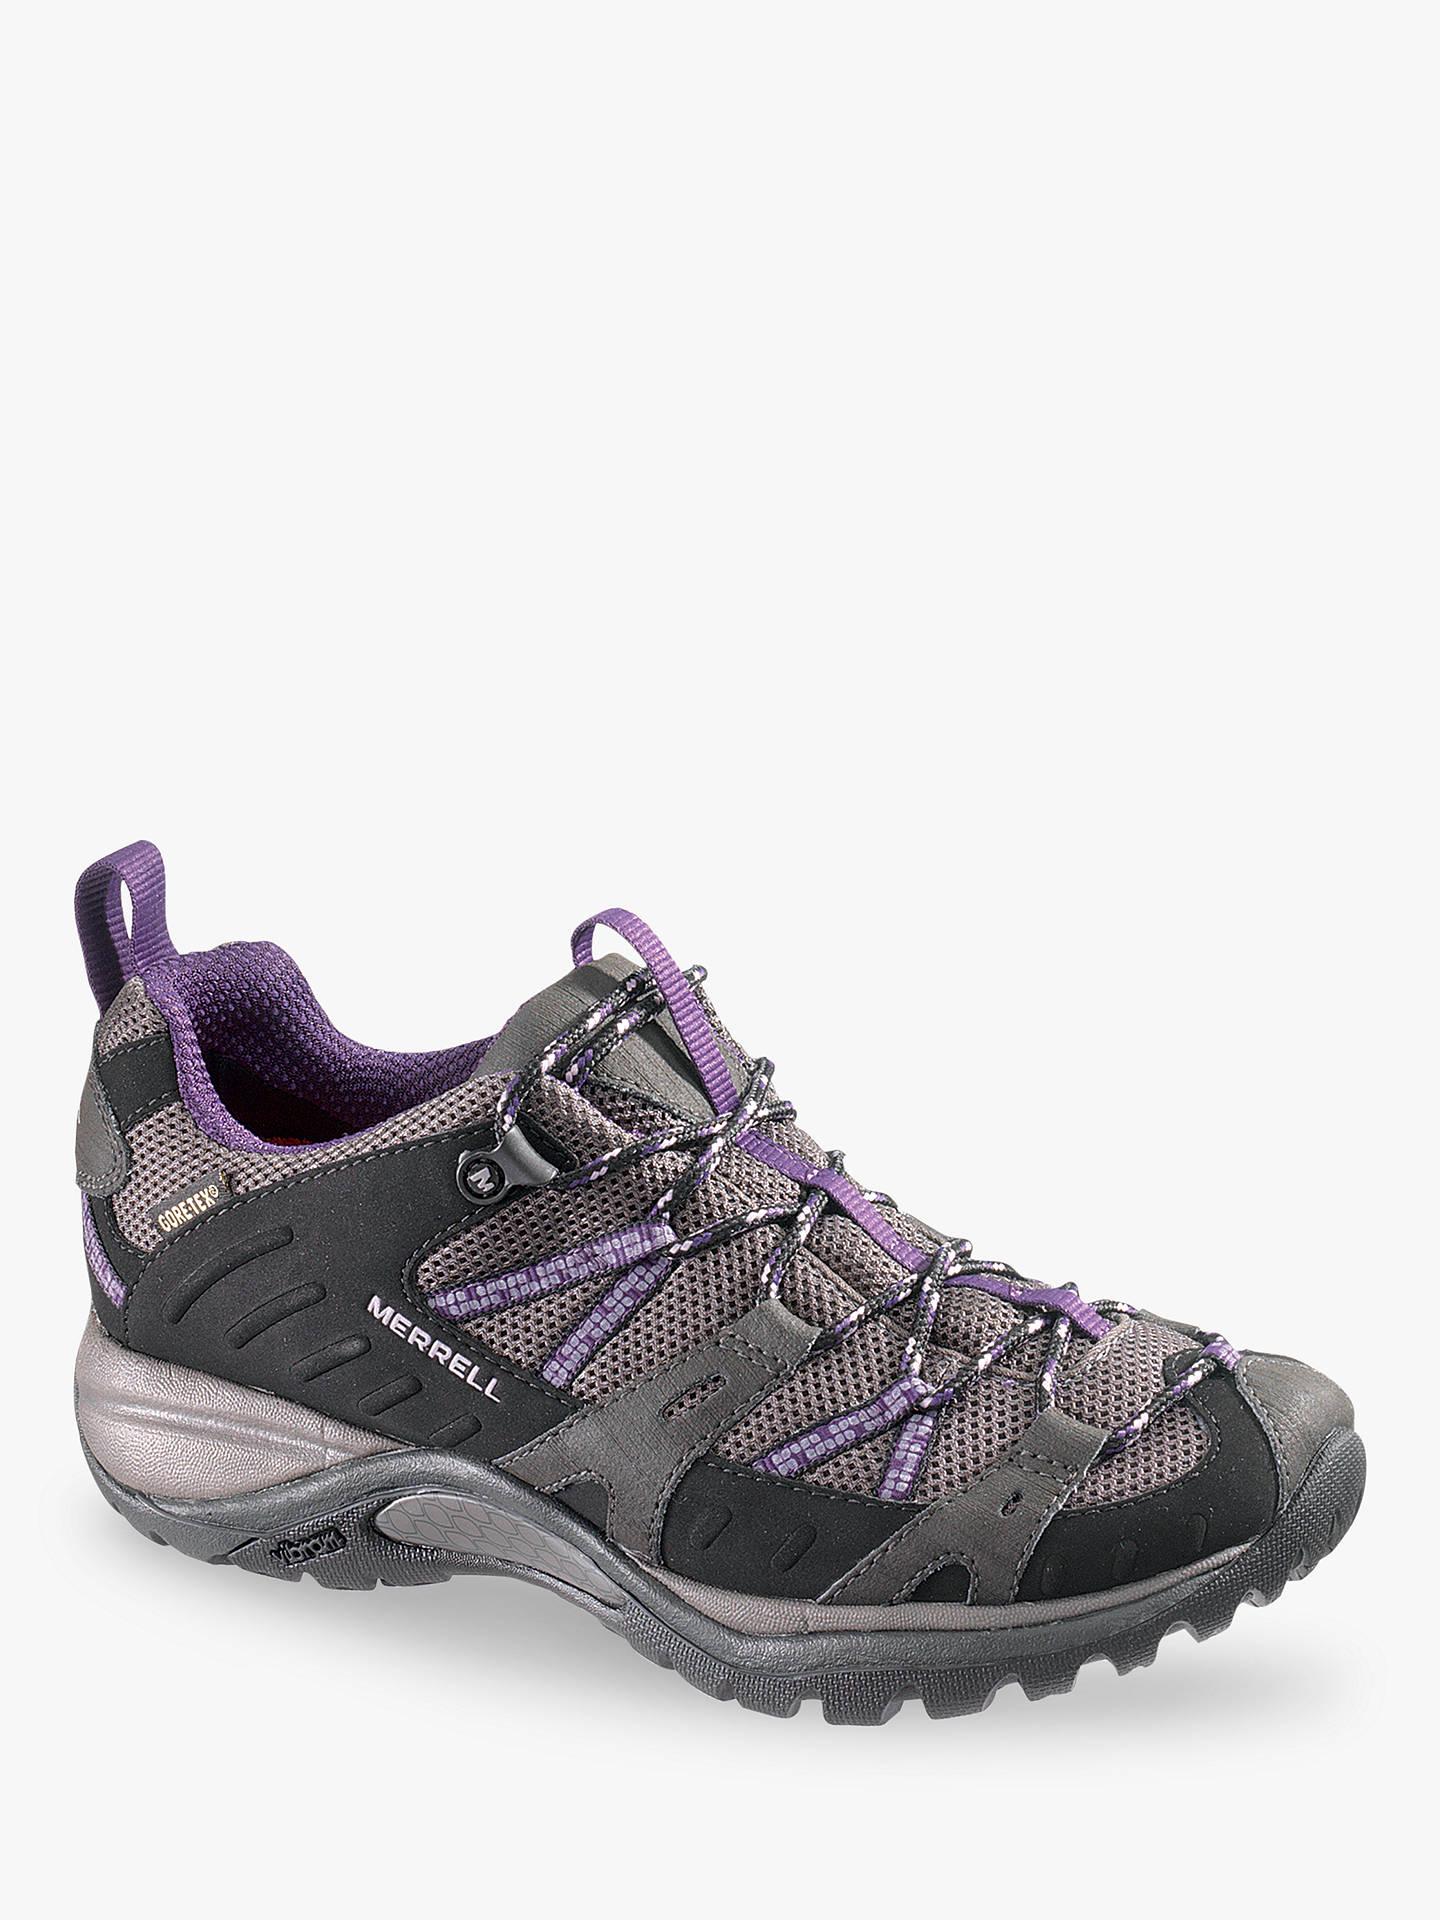 1aaa9f1a202a4 Buy Merrell Women's Siren Sport Gore-Tex Walking Shoes, Black/Plum, 5